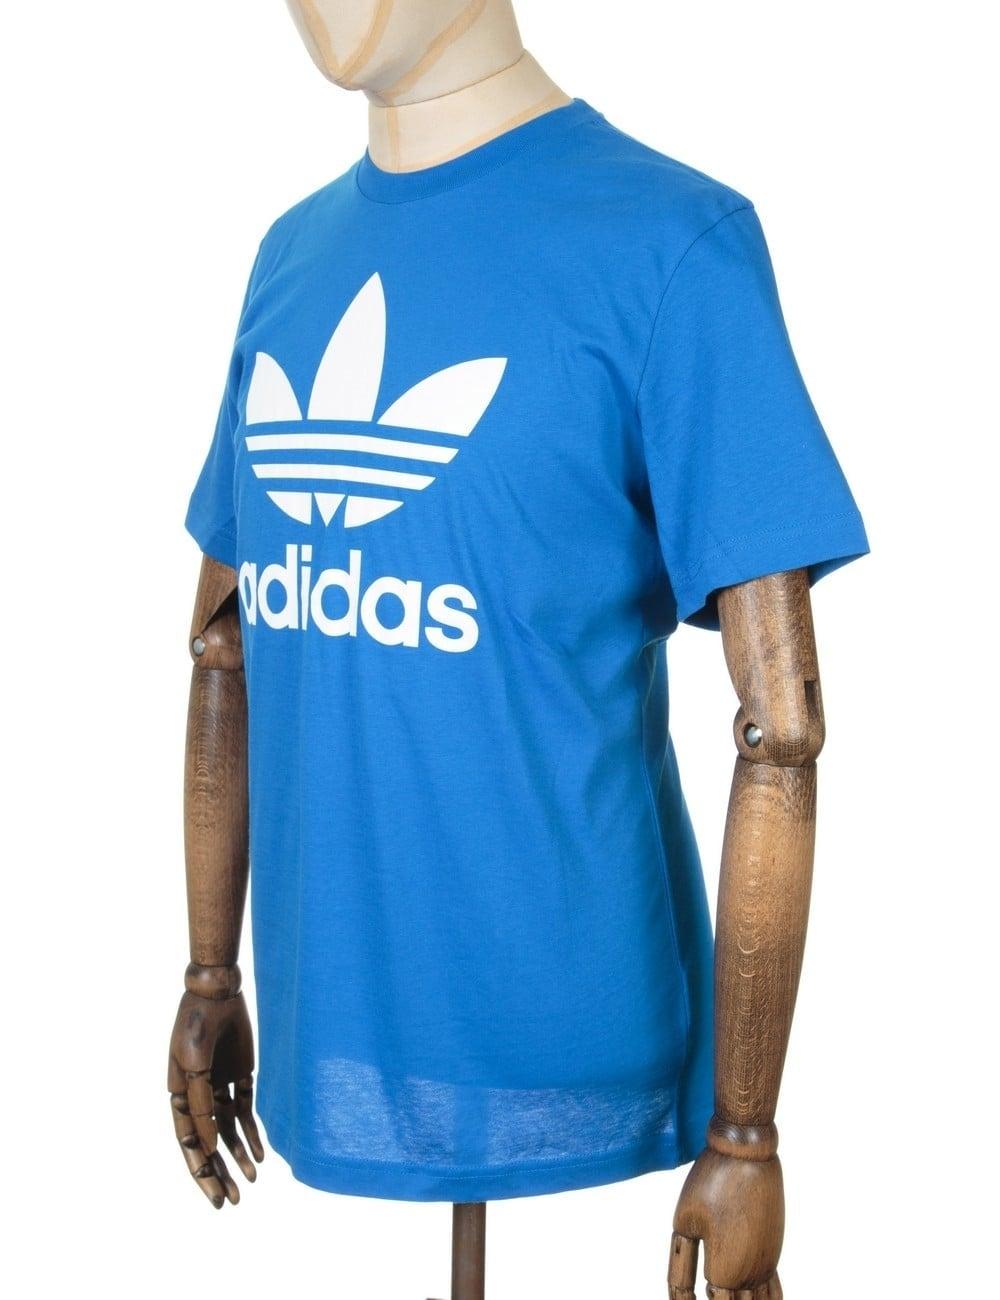 adidas orig trefoil t t-shirt